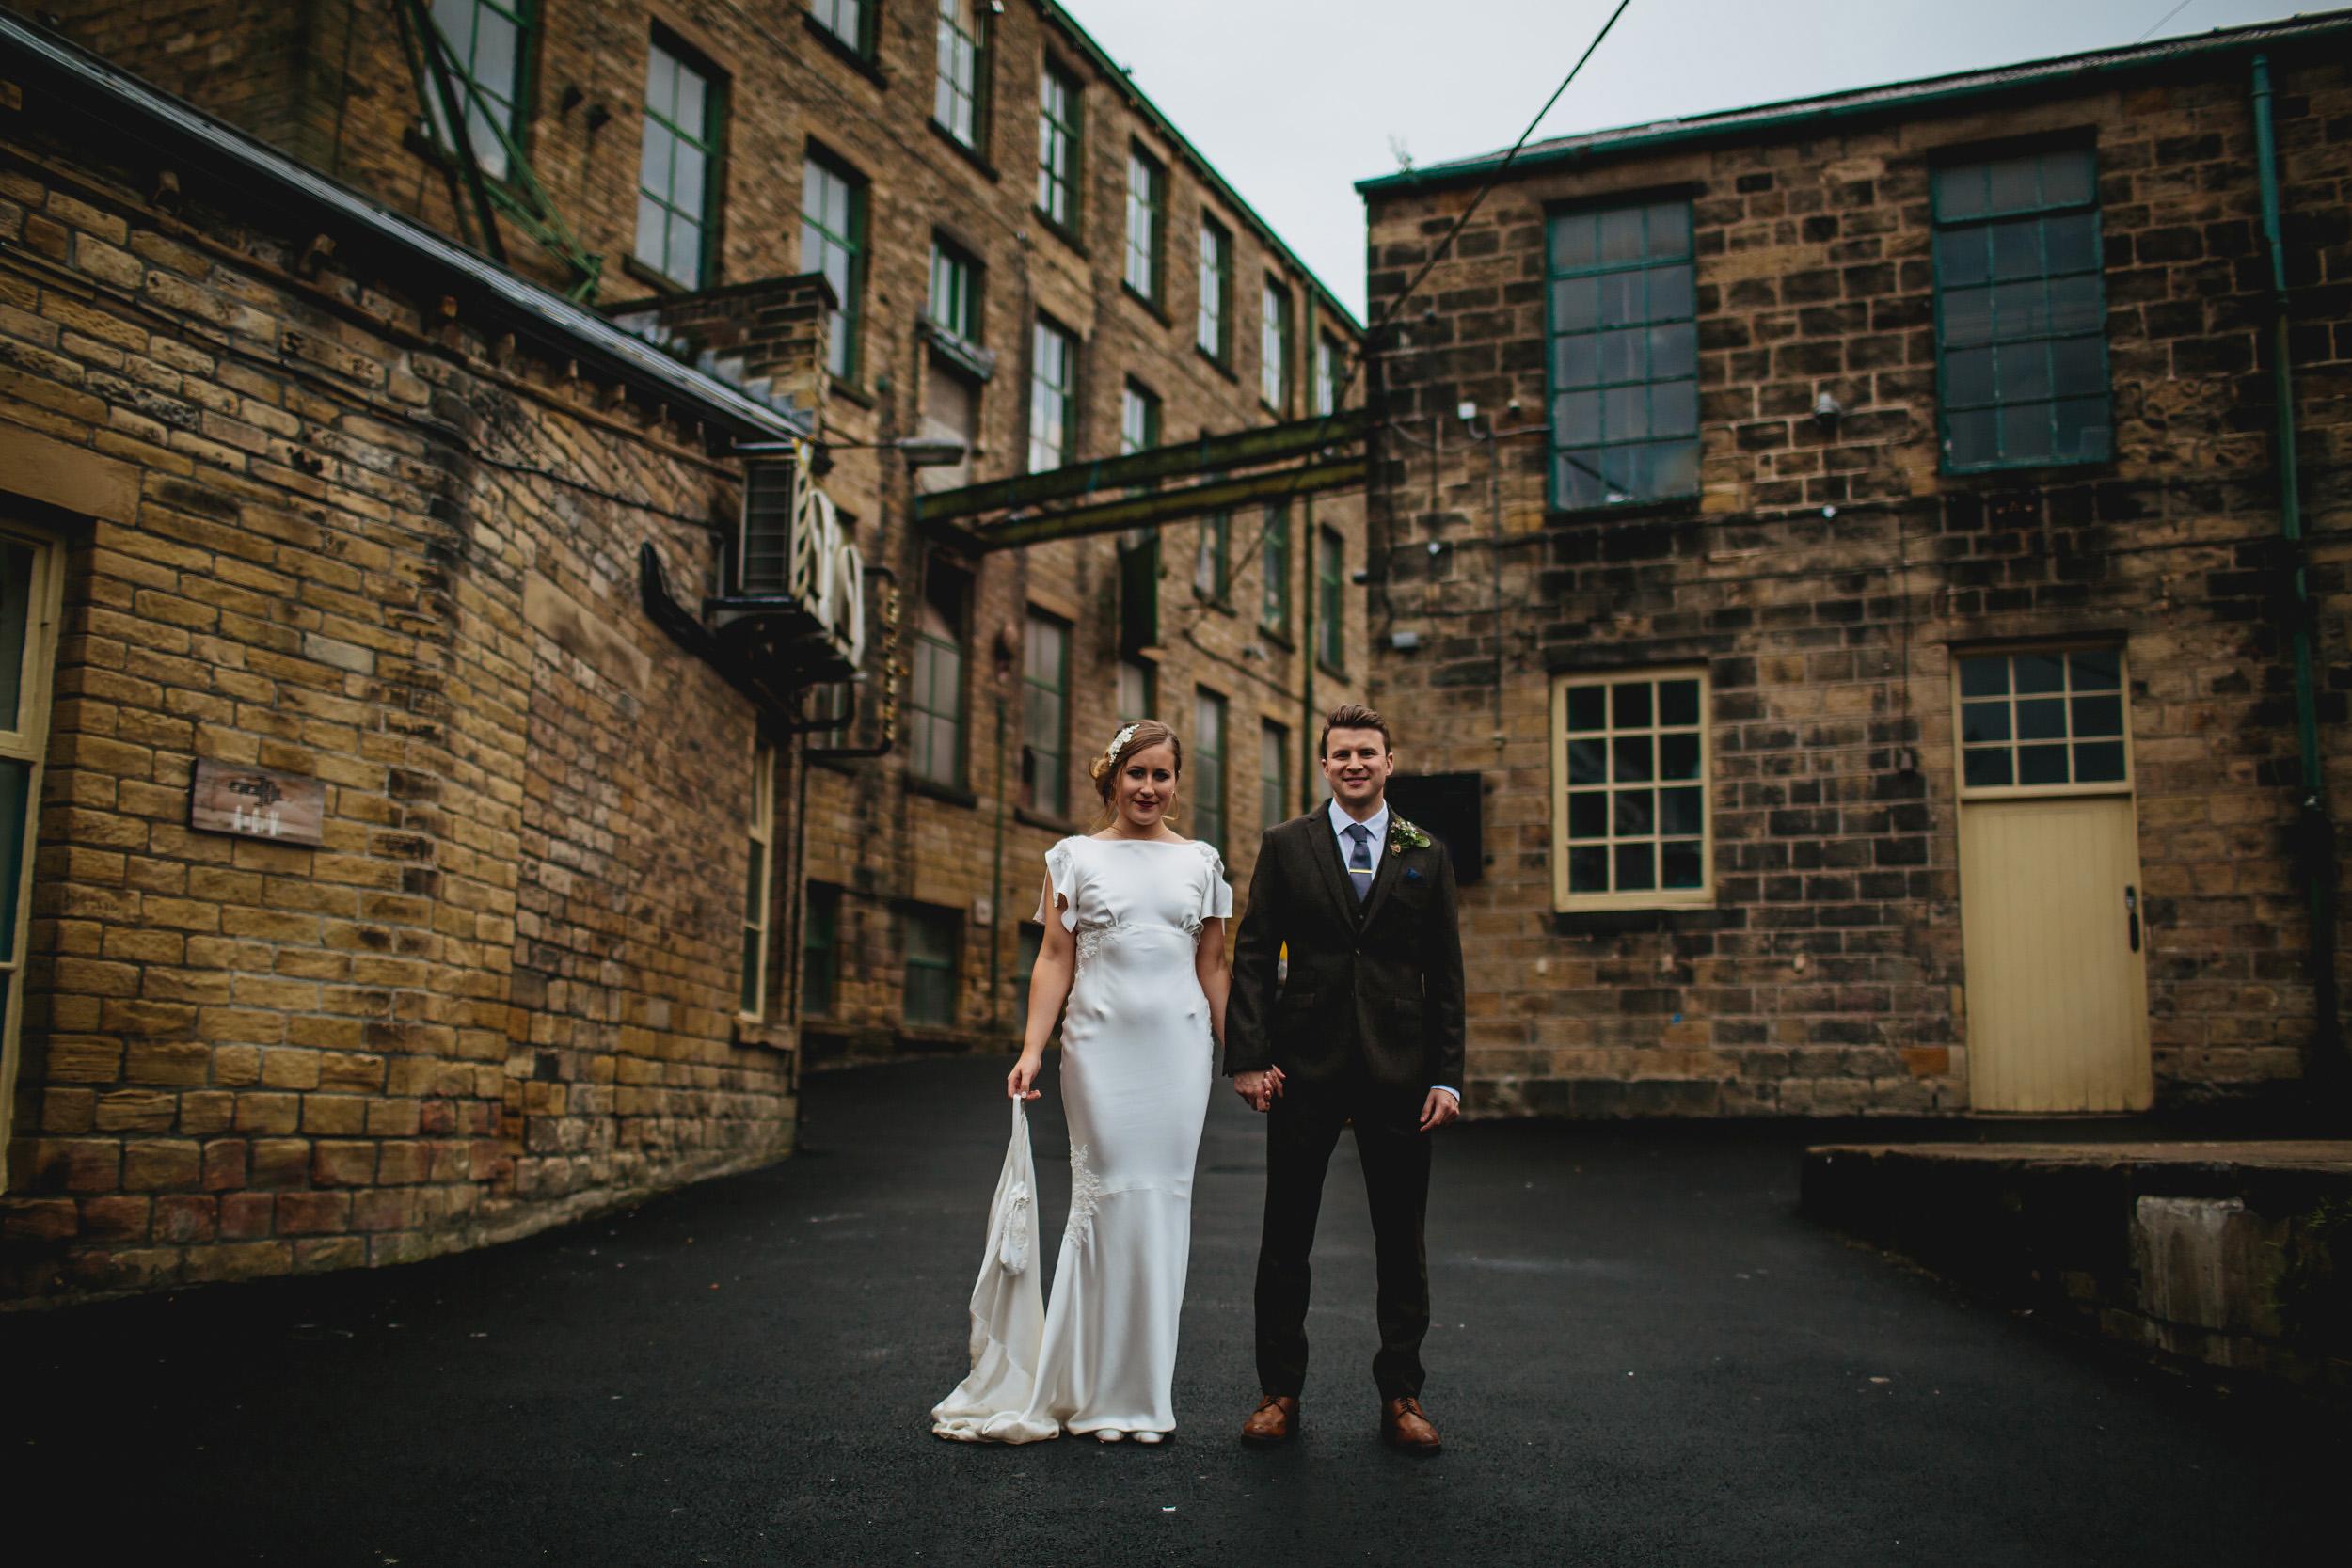 Wedding portrait at Sunny Bank Mills Leeds